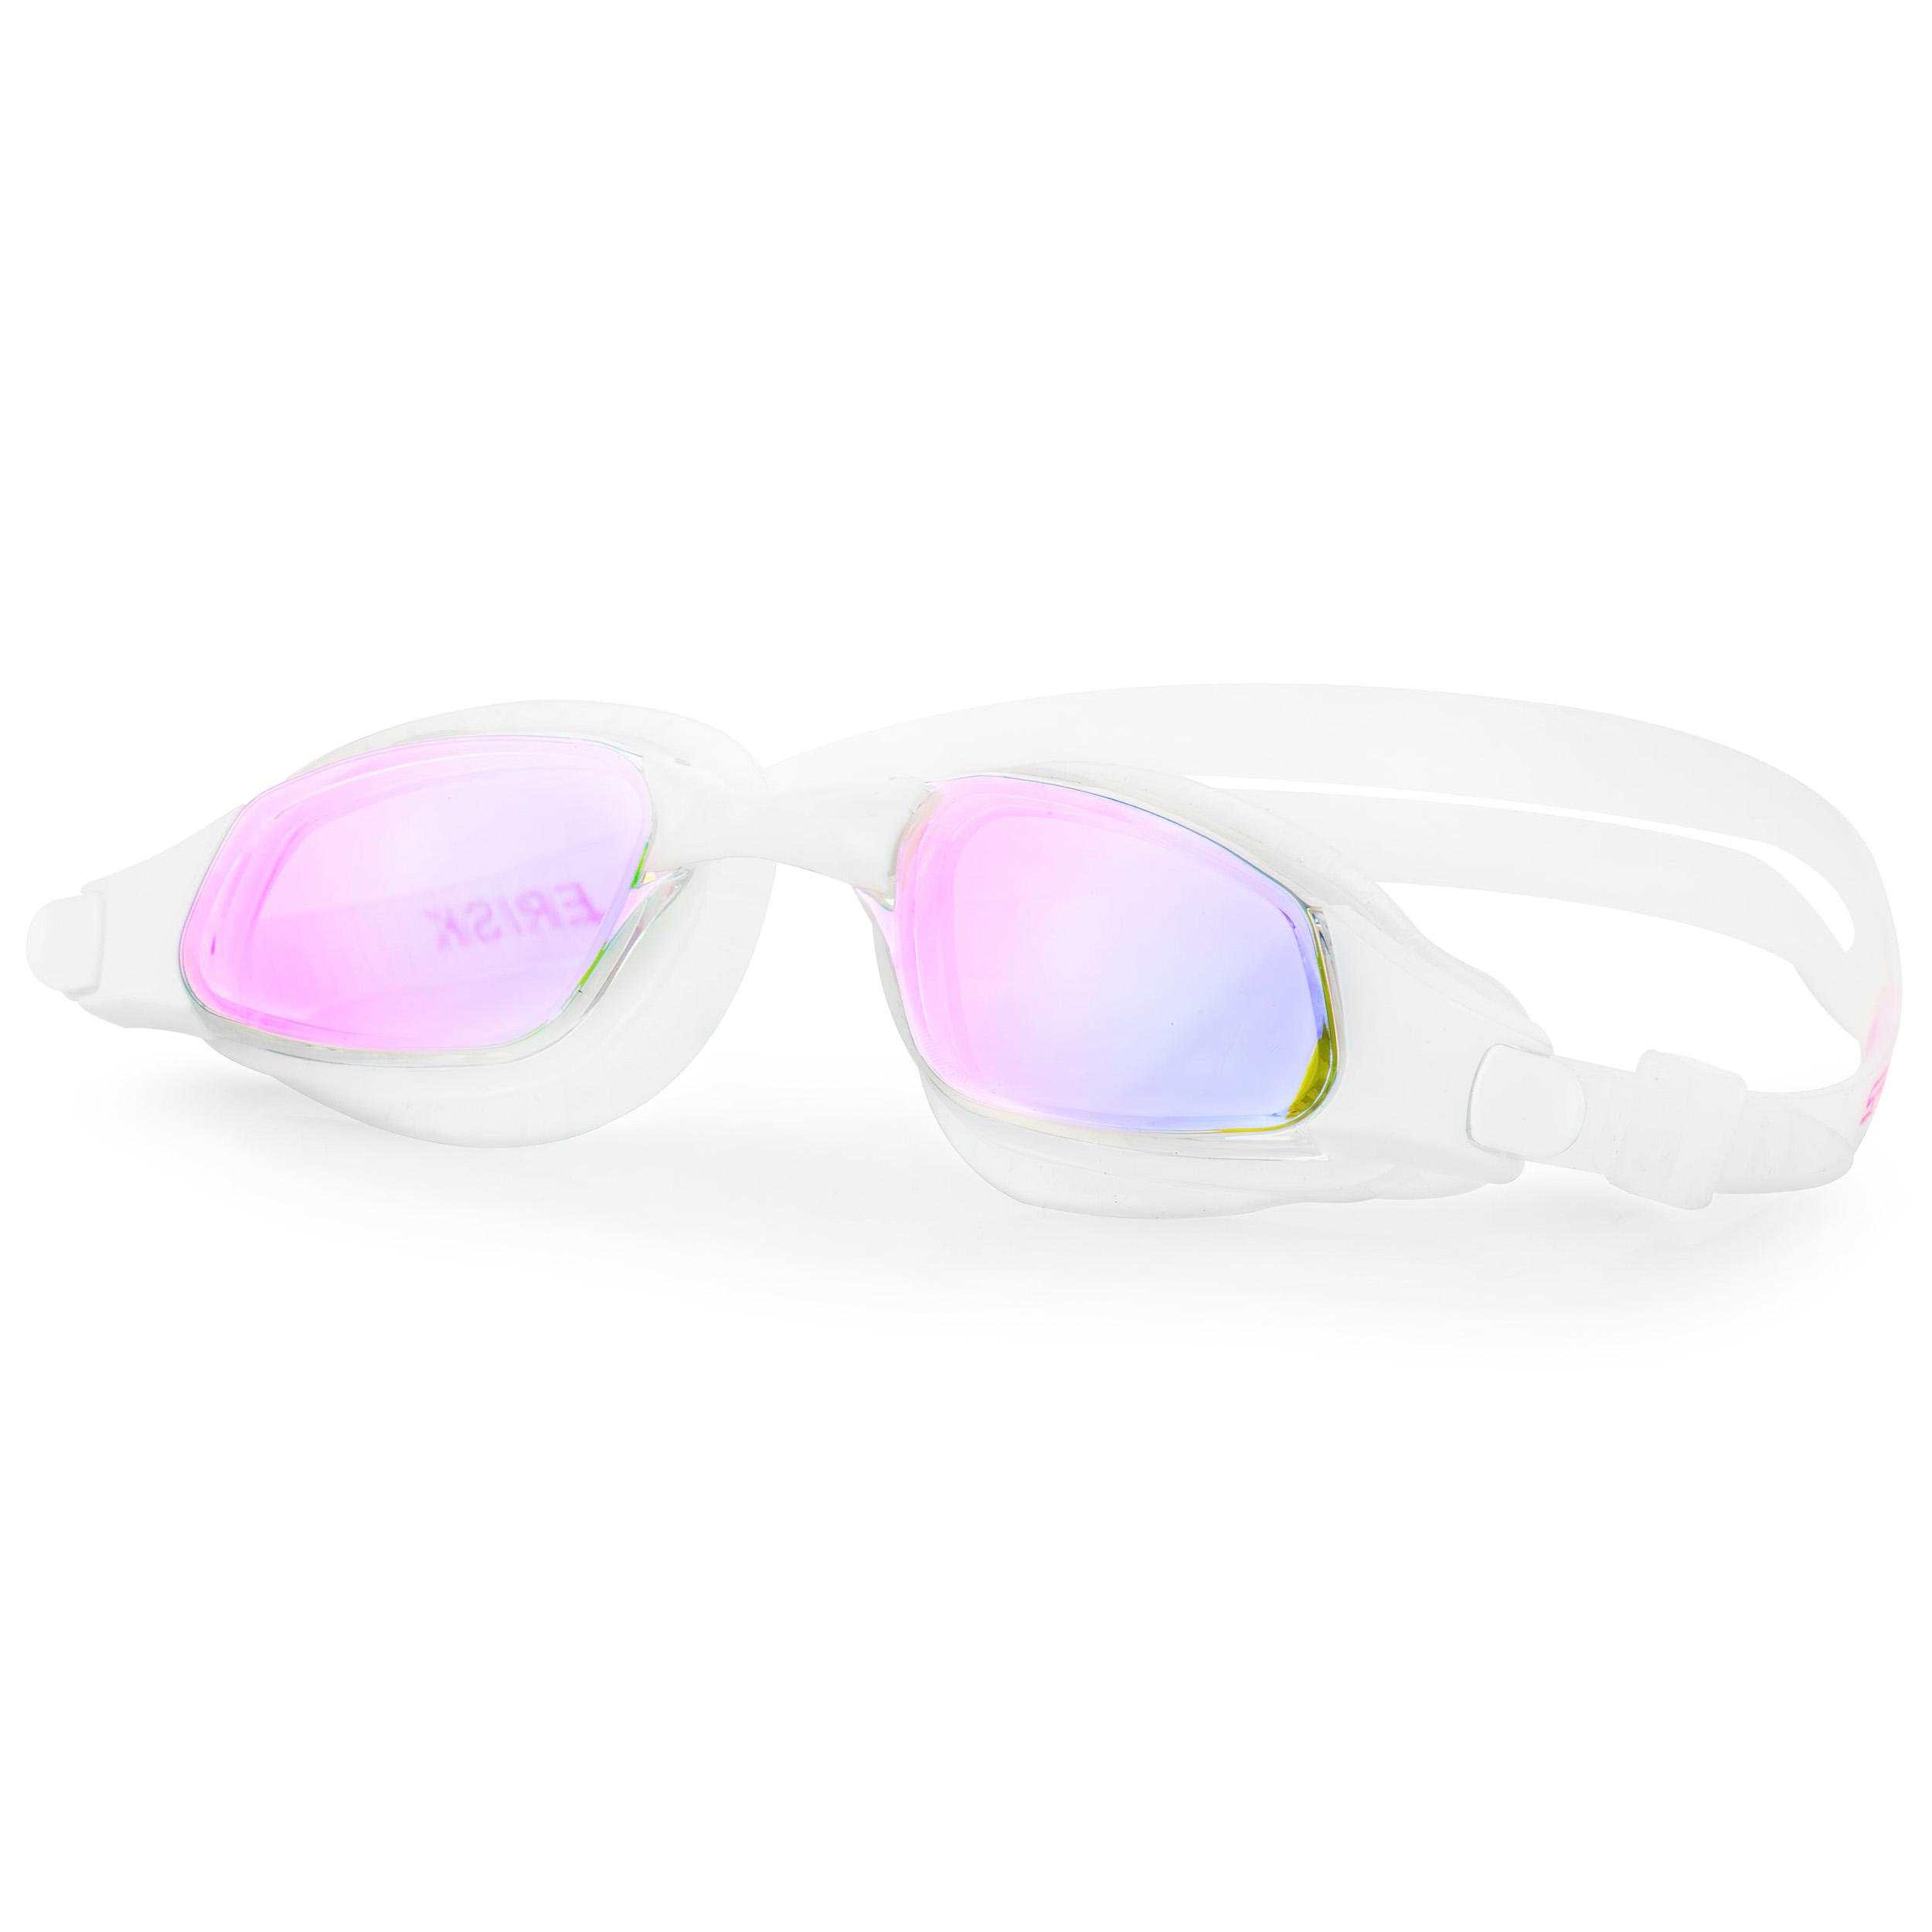 Plavecké brýle ERISK bílé